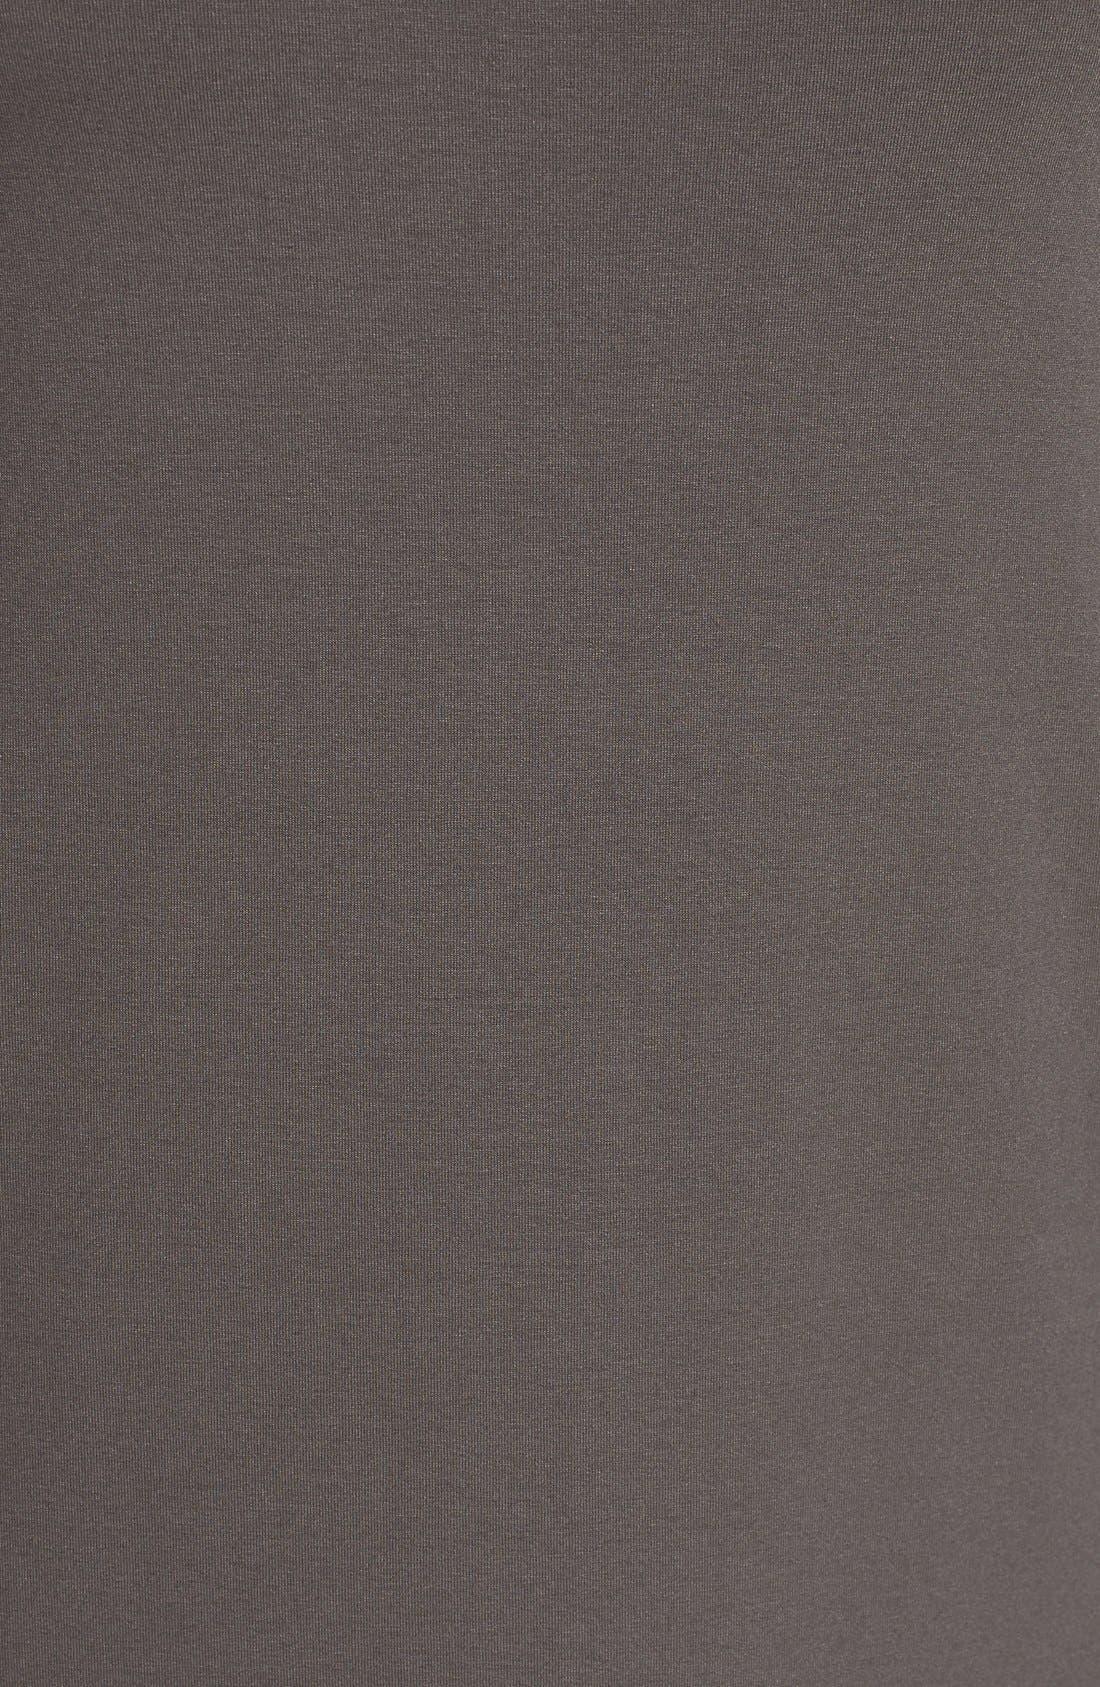 Alternate Image 5  - Eileen Fisher Scoop Neck Jersey Midi Dress (Regular & Petite)